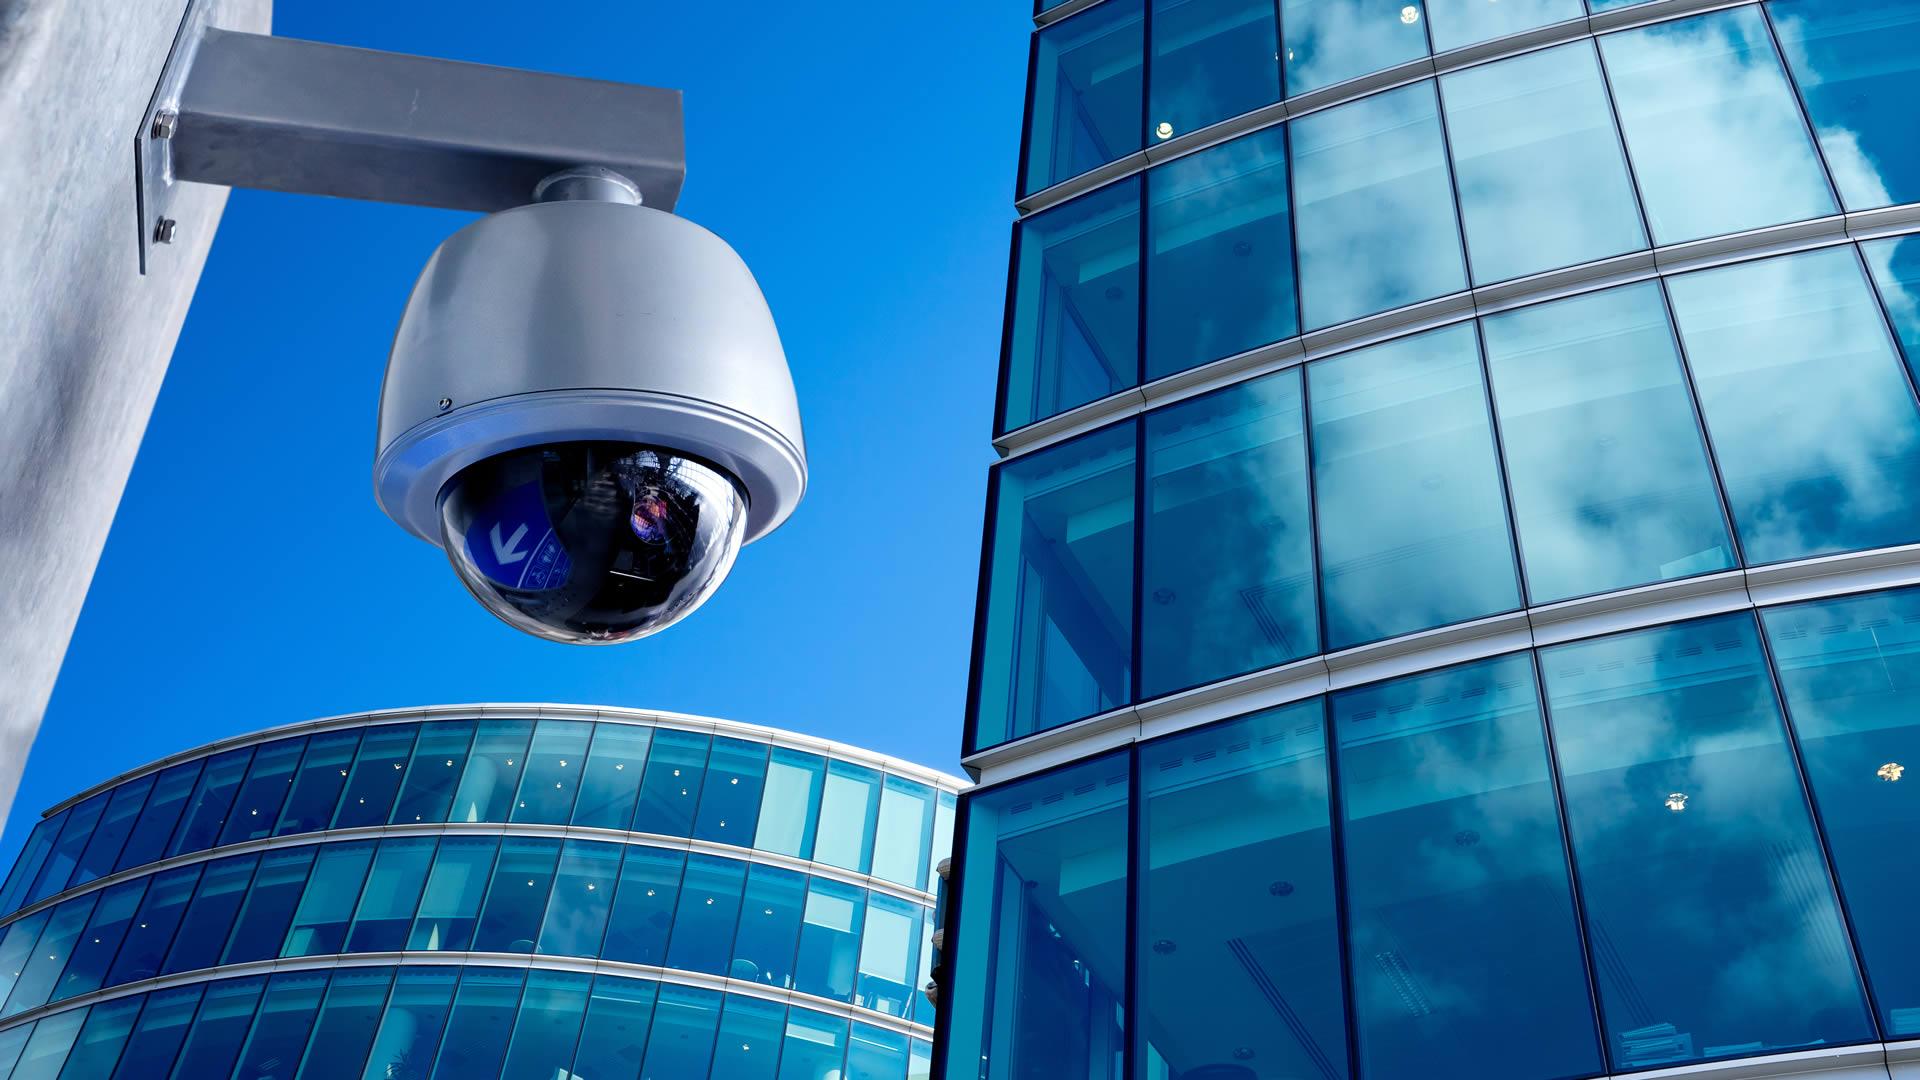 IP CCTV Support